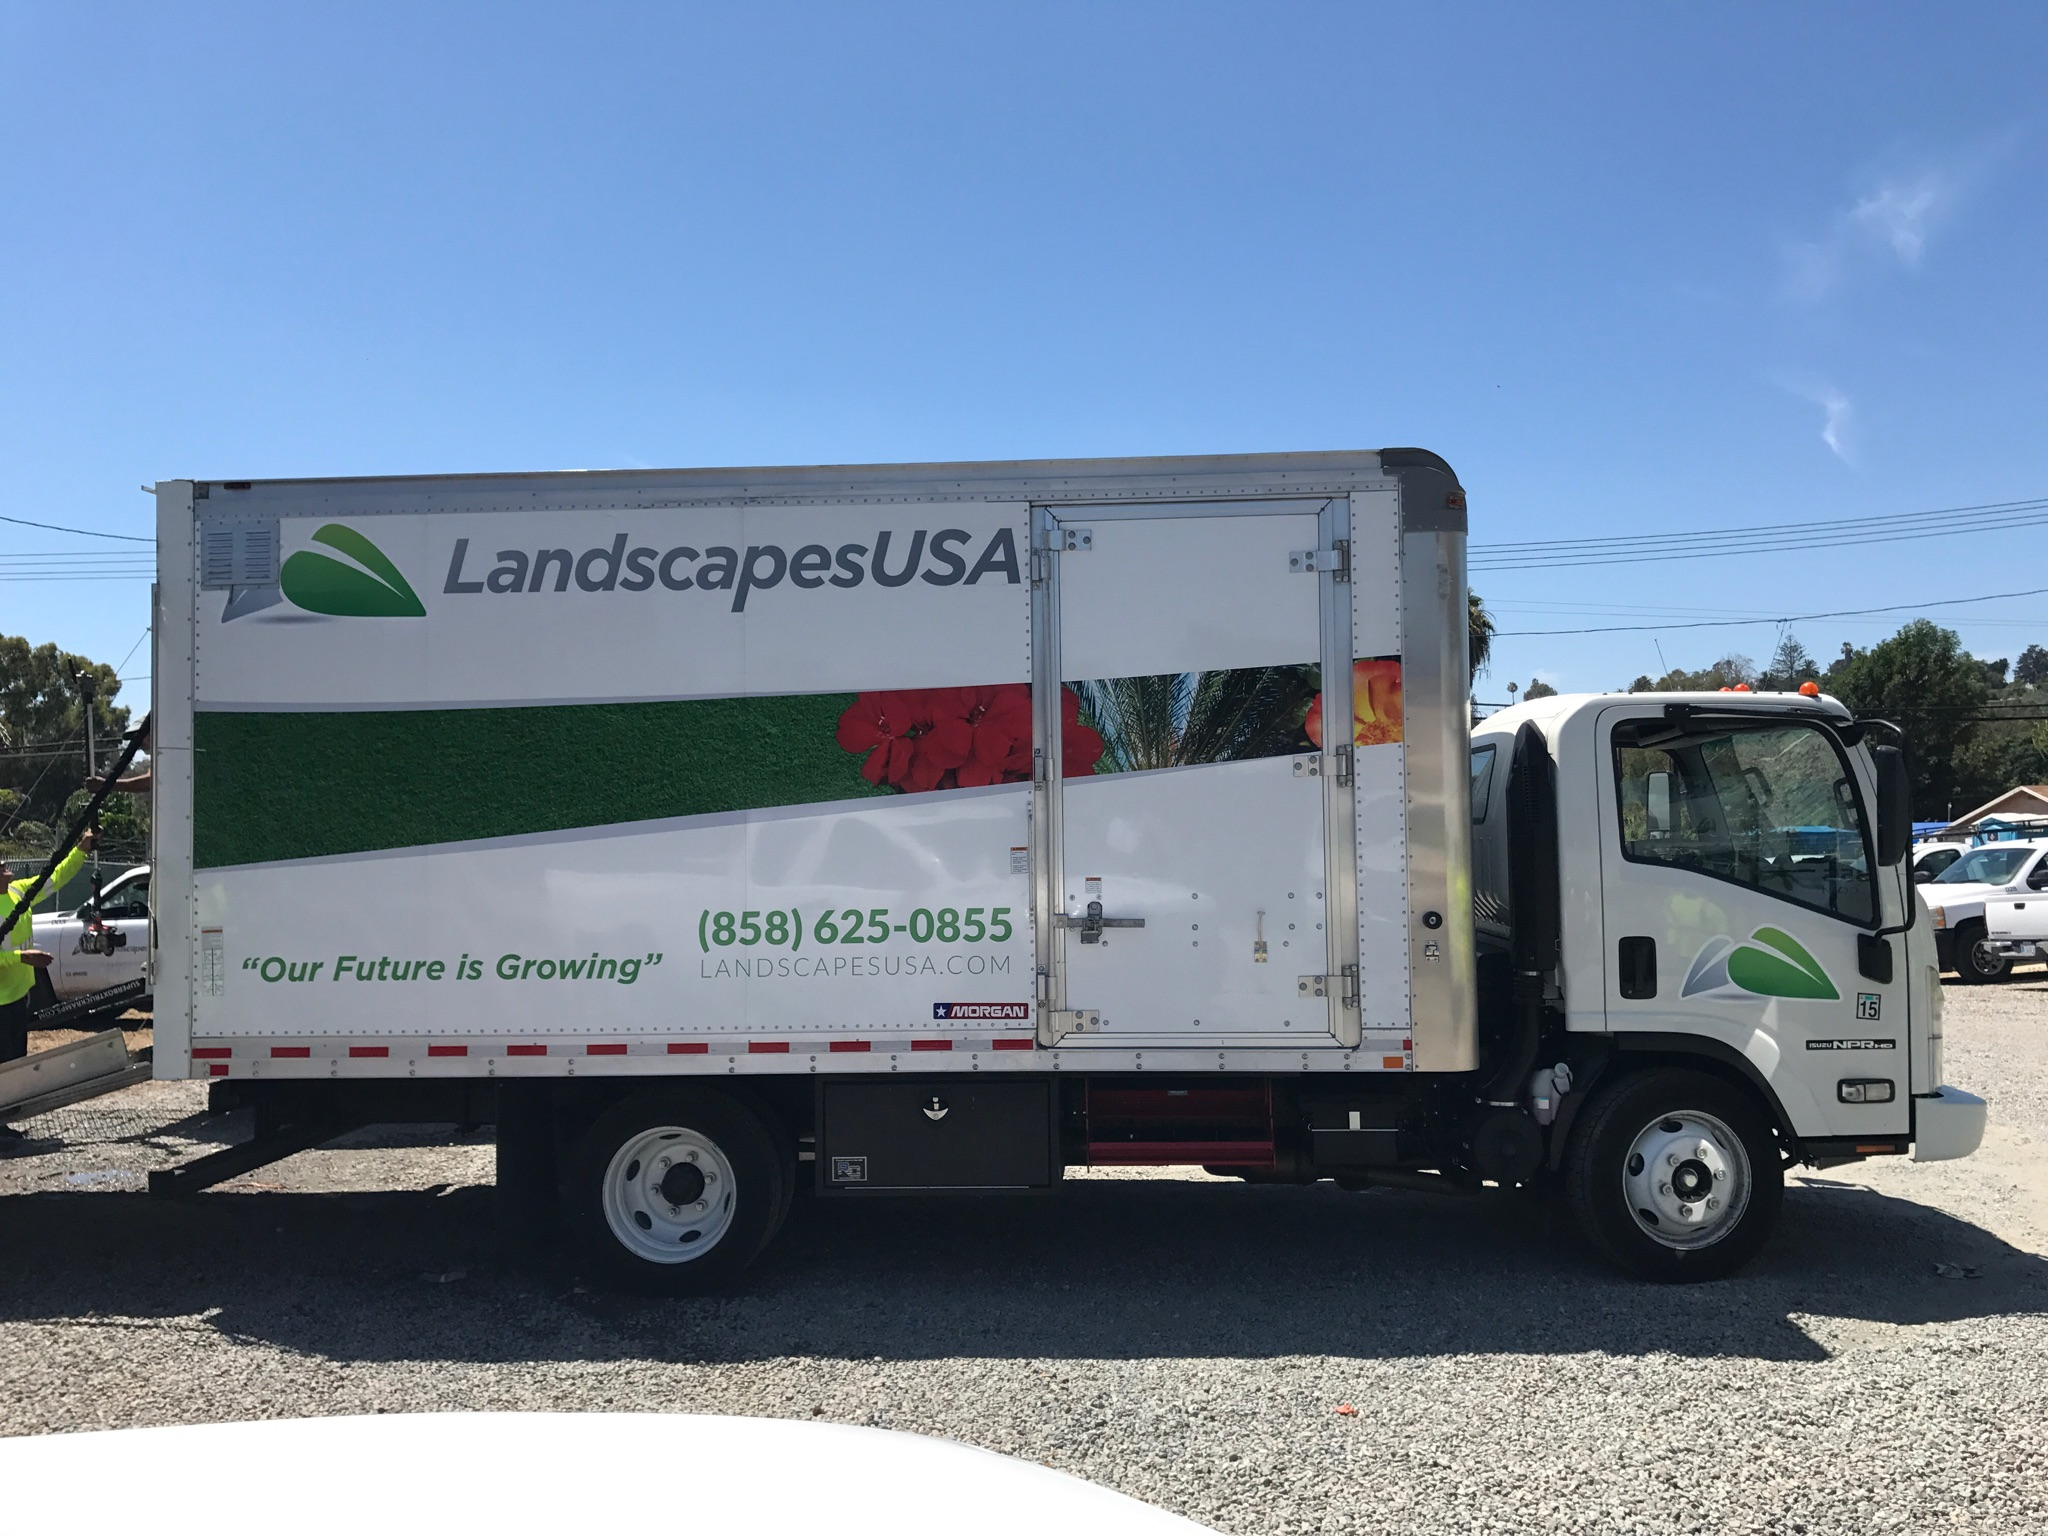 Trailer or Truck Body? Landscape Fleet Weighs Options